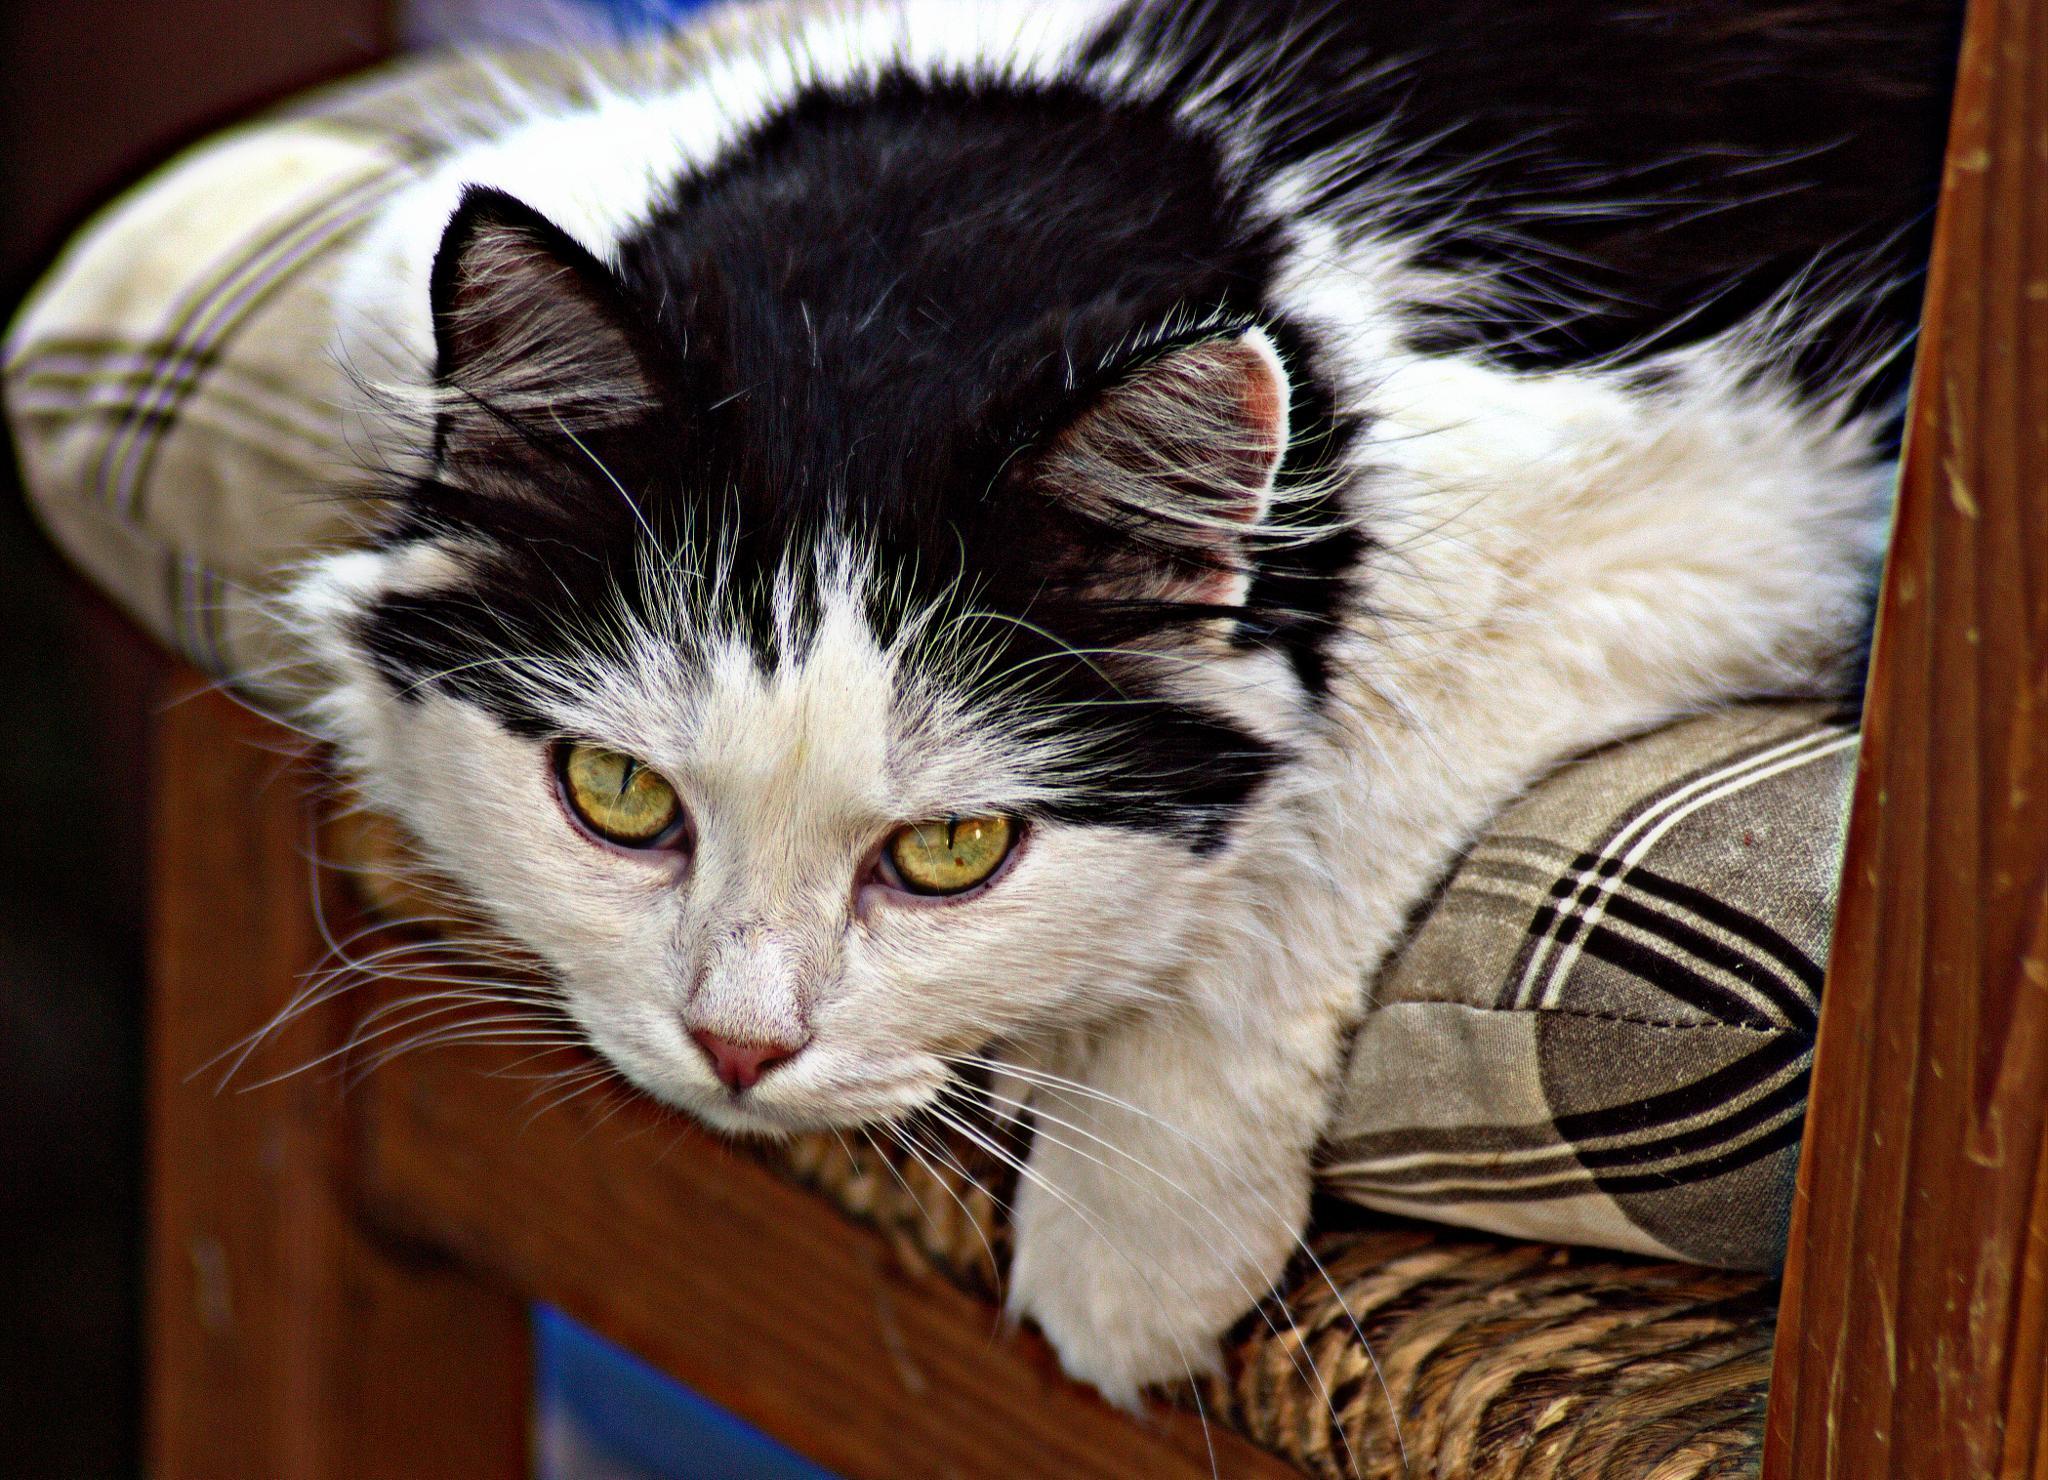 CAT is always grateful to klick ... by leopold.brzin